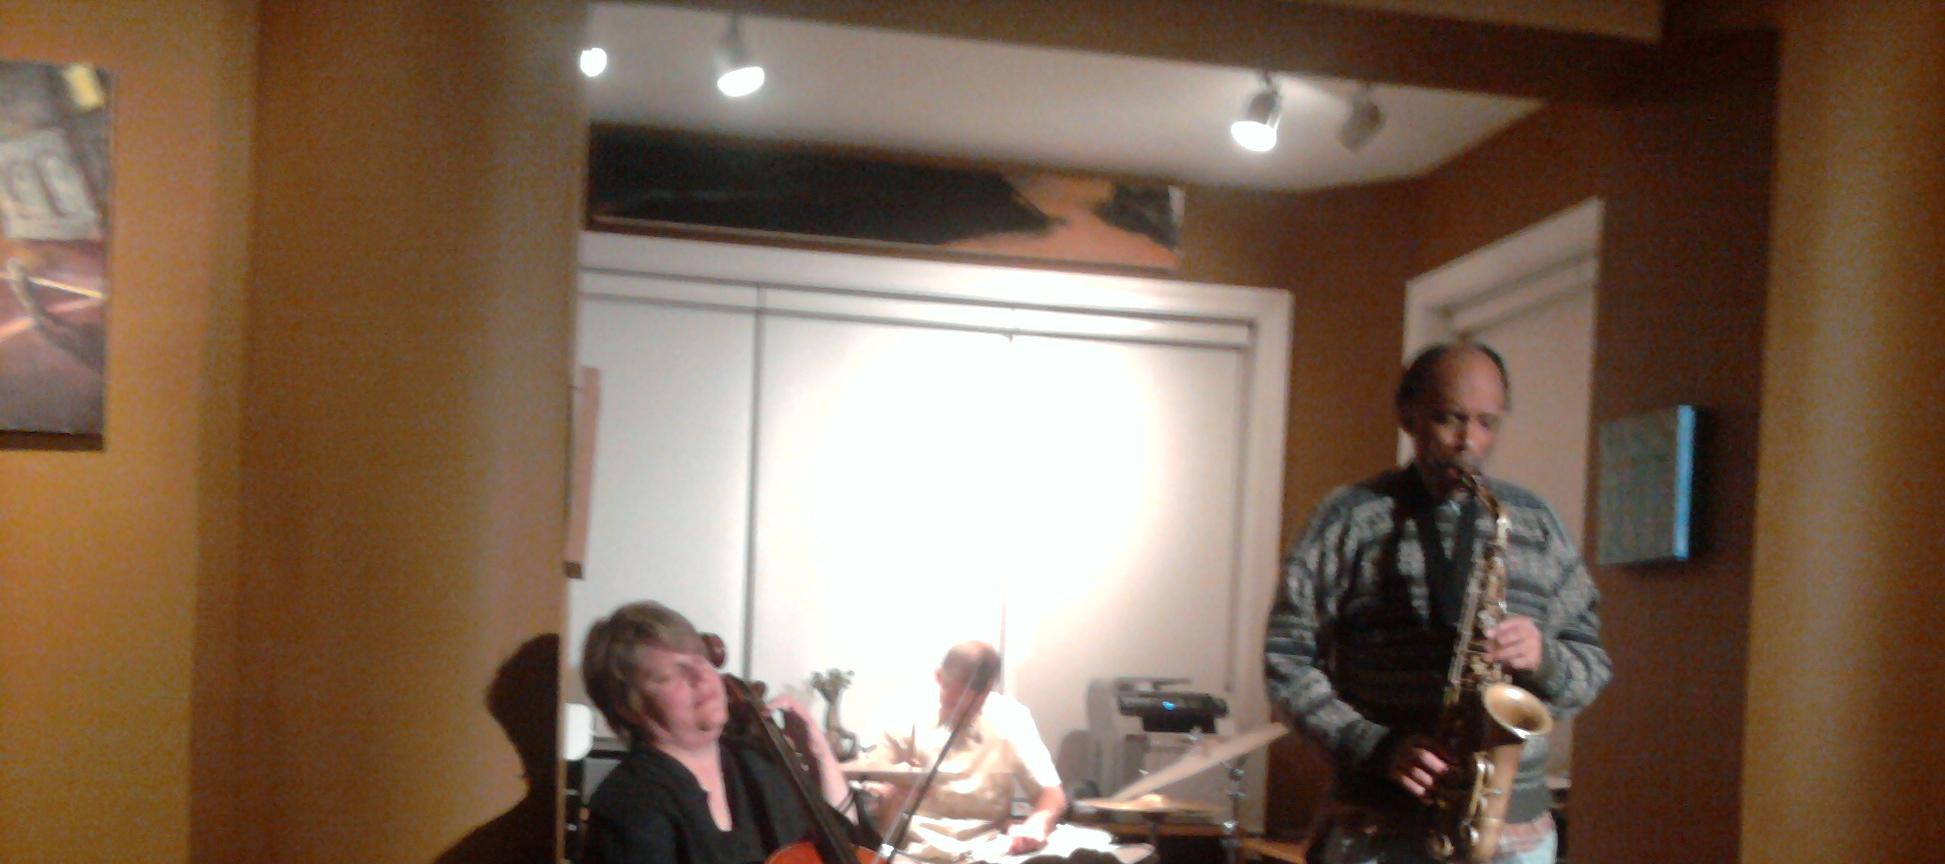 Jimmy Bennington, Daniel Carter, Cathy Kuna, Colour and Sound Series House Concert, Chicago 2010